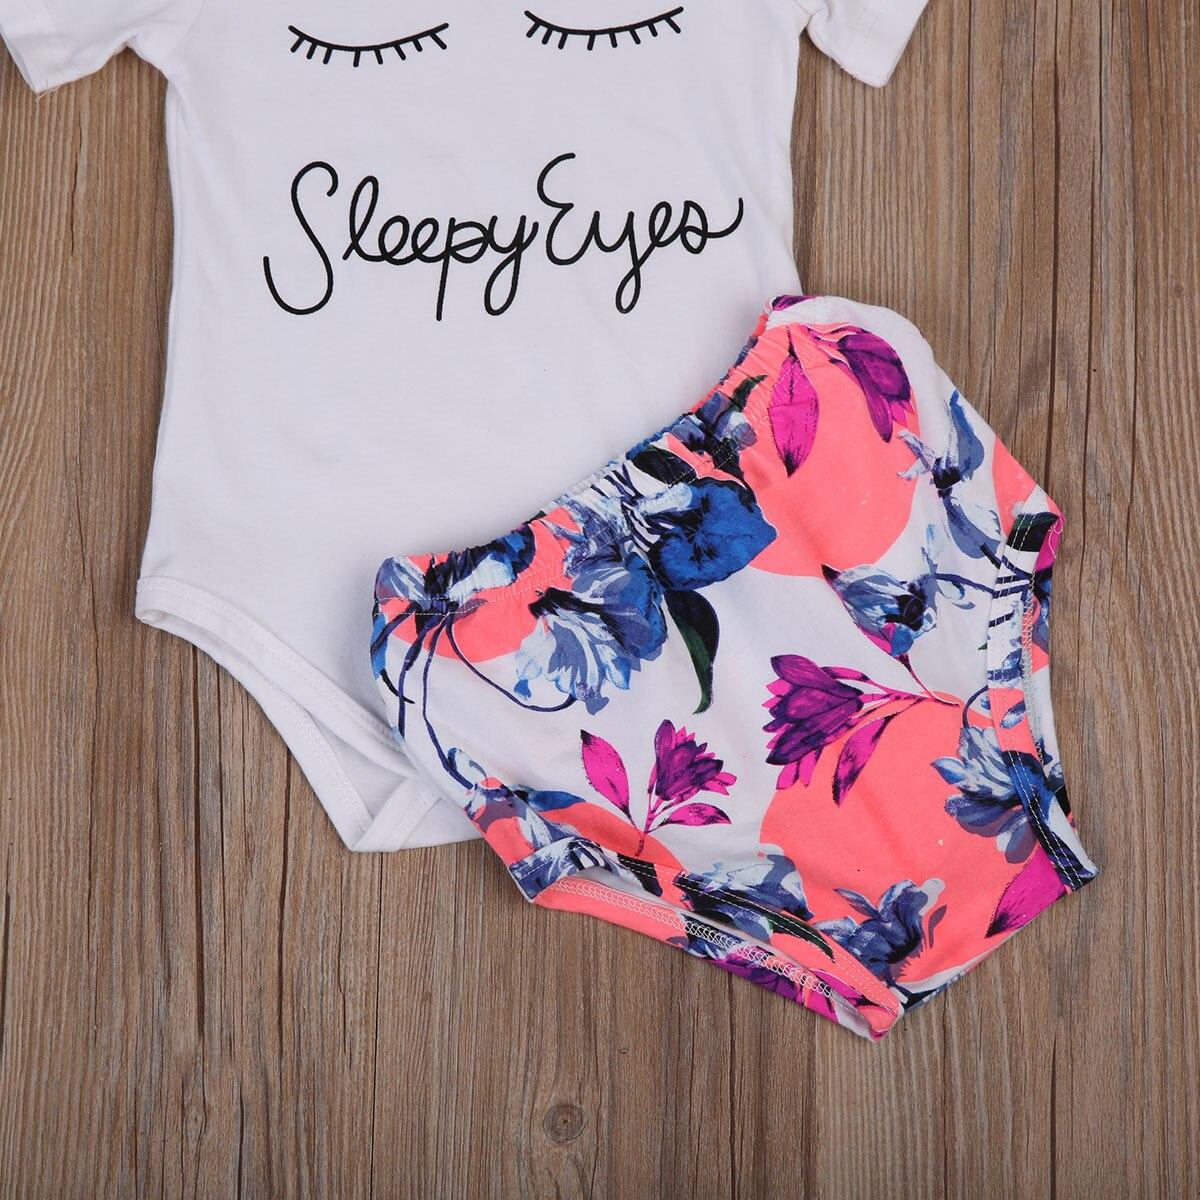 Newborn Infant Baby Girls Floral Short Briefs Headband Outfit Clothes Set 3-24M